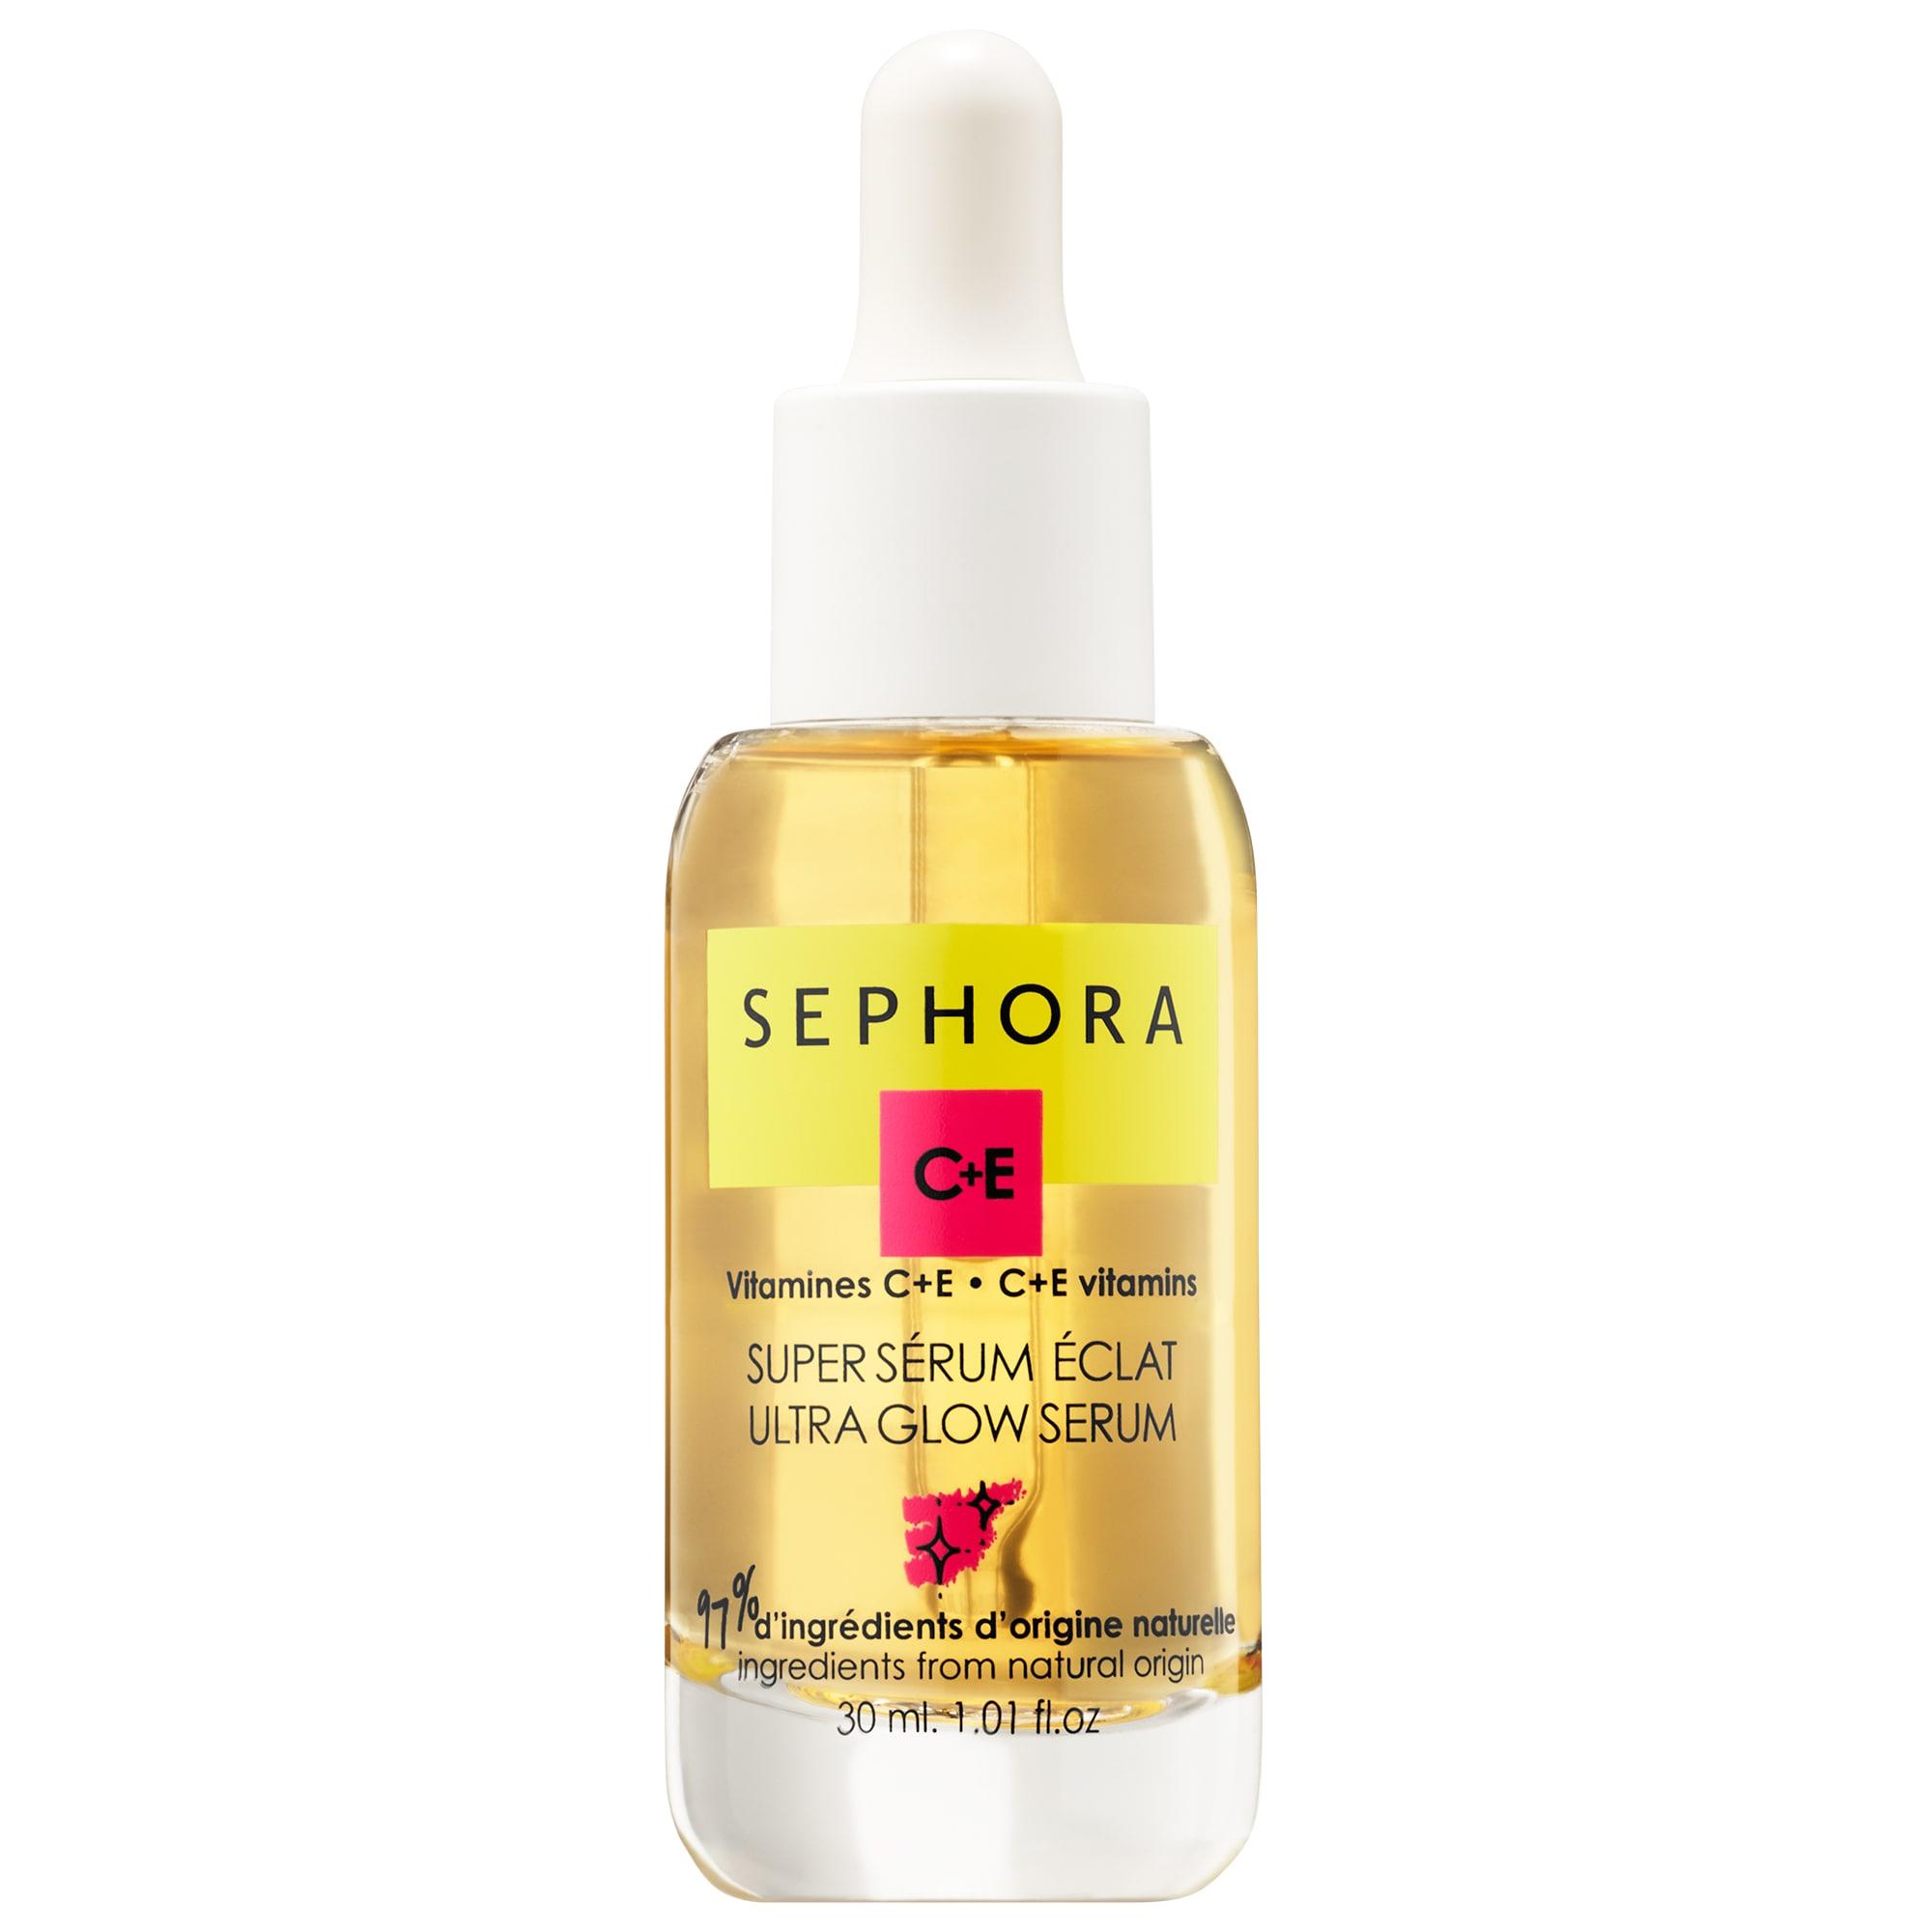 Sephora - Ultra Glow Serum: Glow + Strengthen Vitamin C Serum